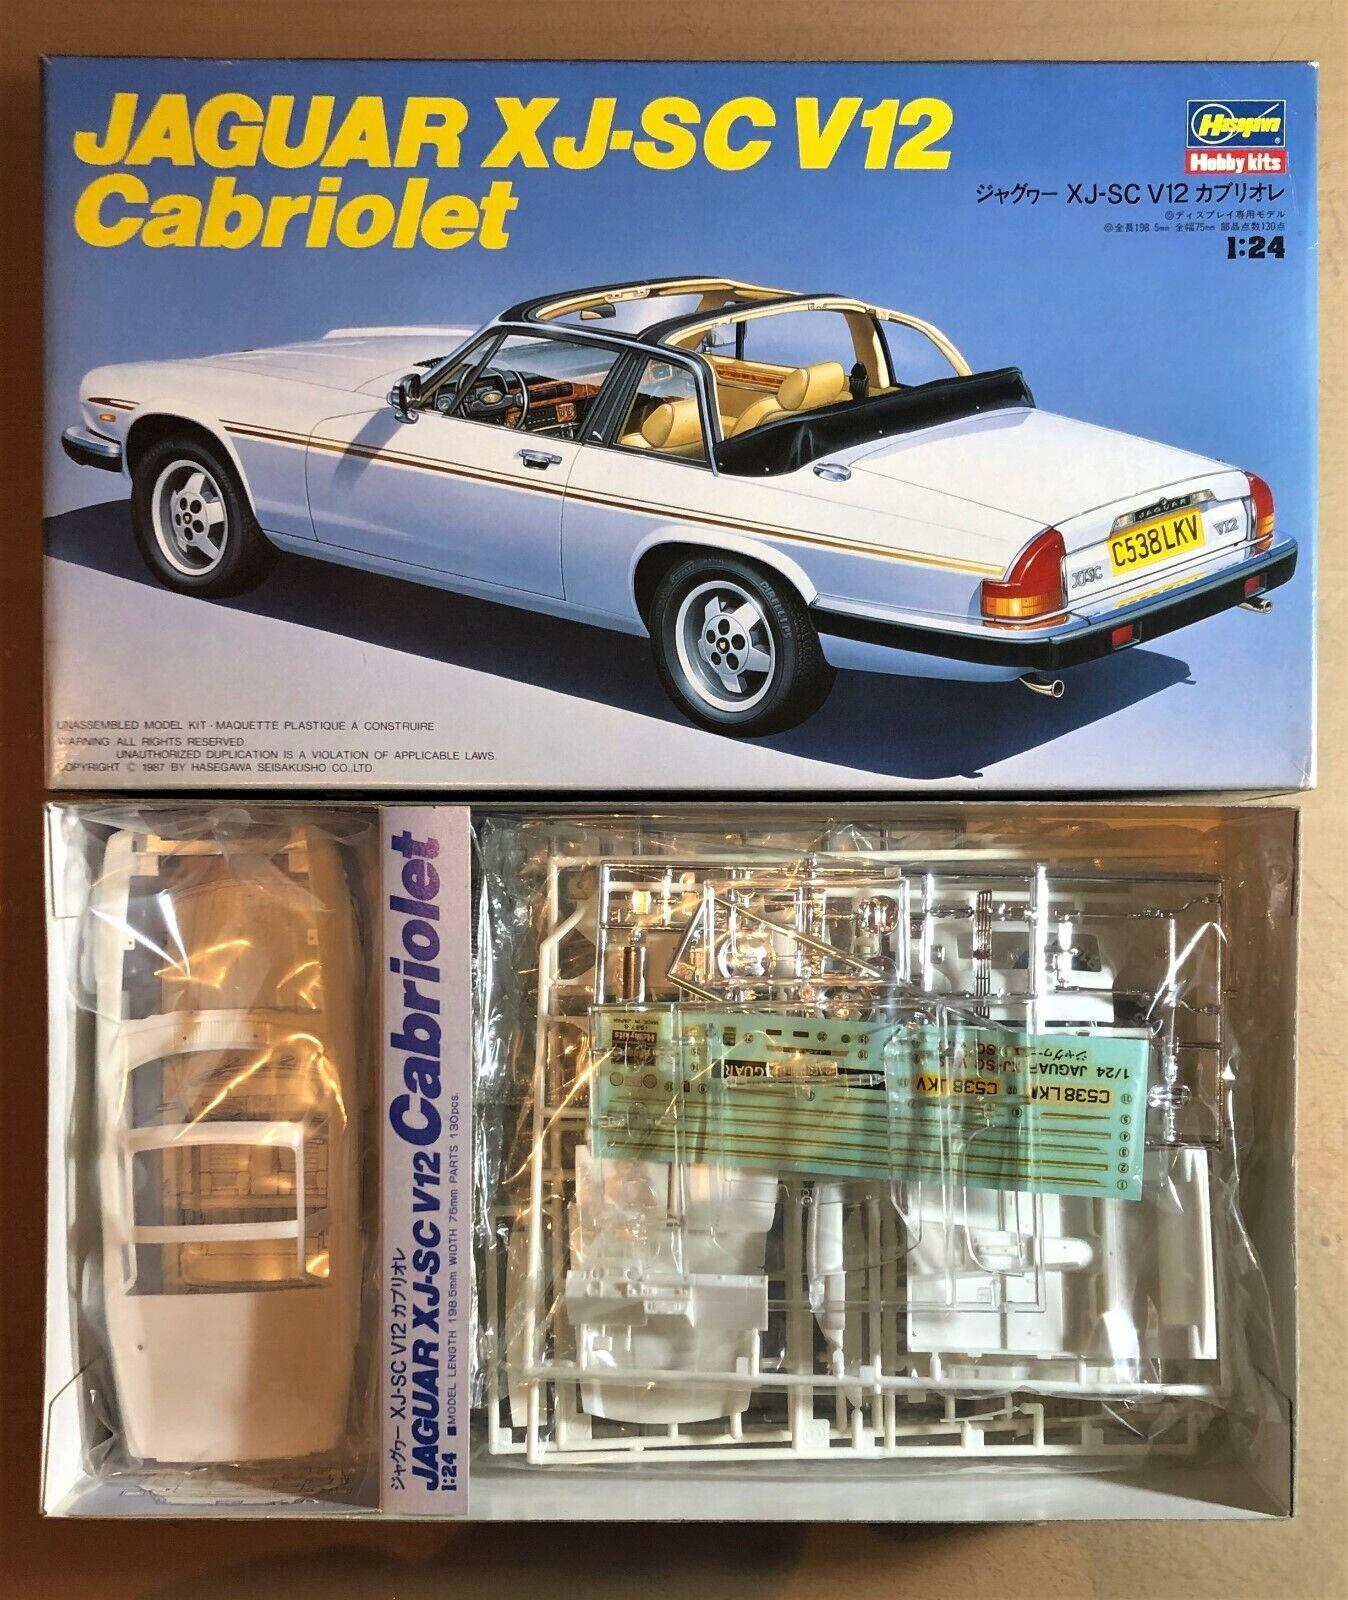 HASEGAWA CA010 1800 - JAGUAR XJ-SC V12 CABRIOLET - - - 1 24 PLASTIC KIT d78846